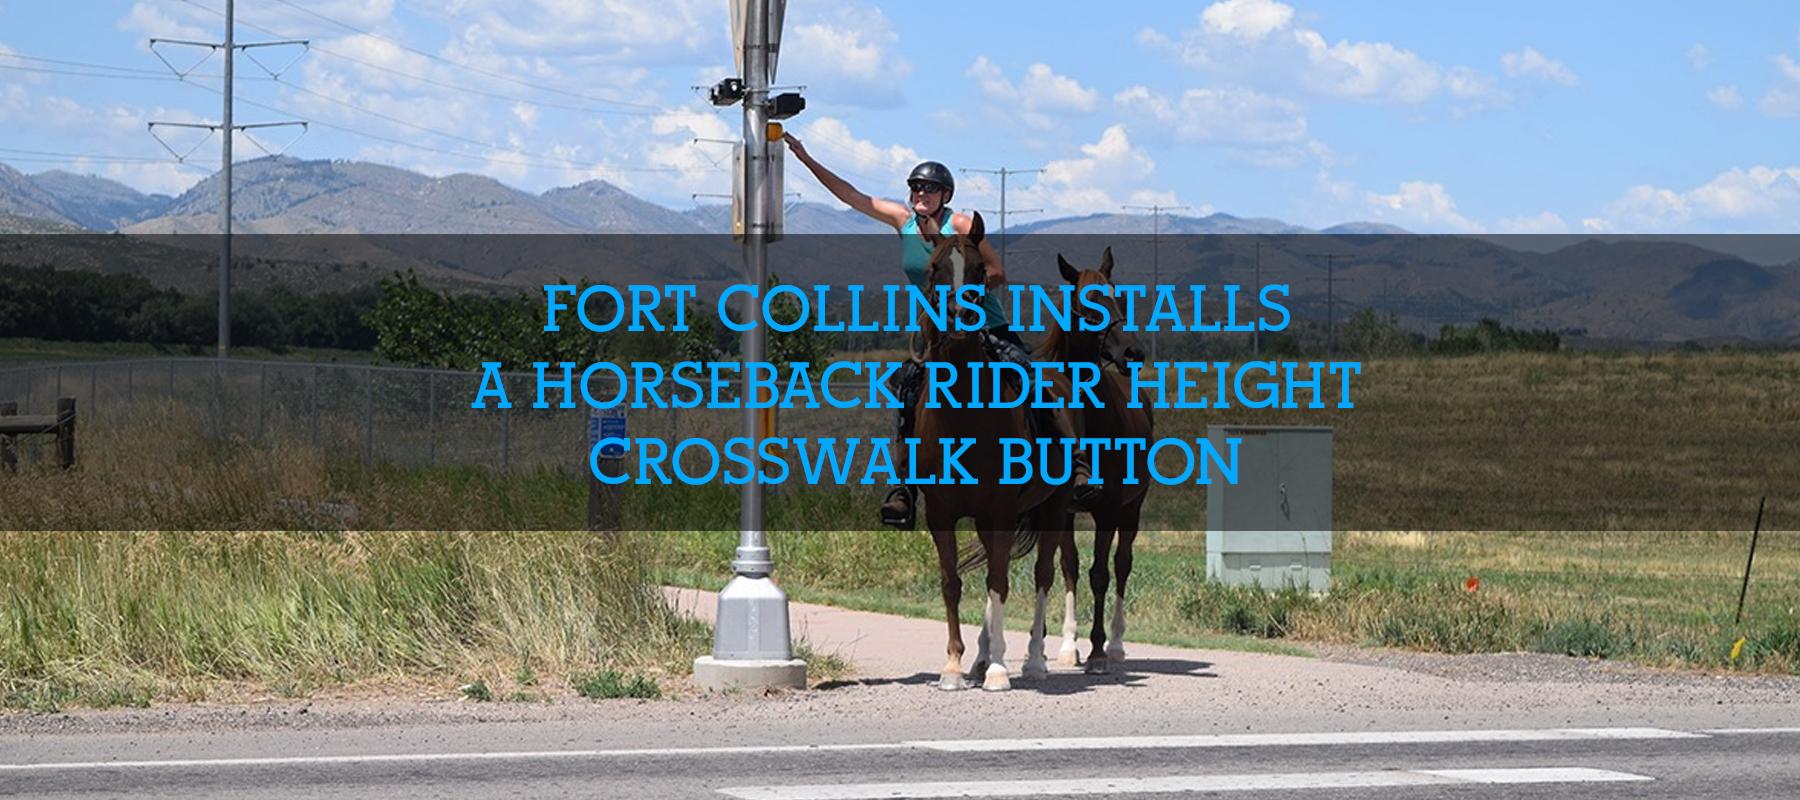 Crosswalk Button for Horseback Riders